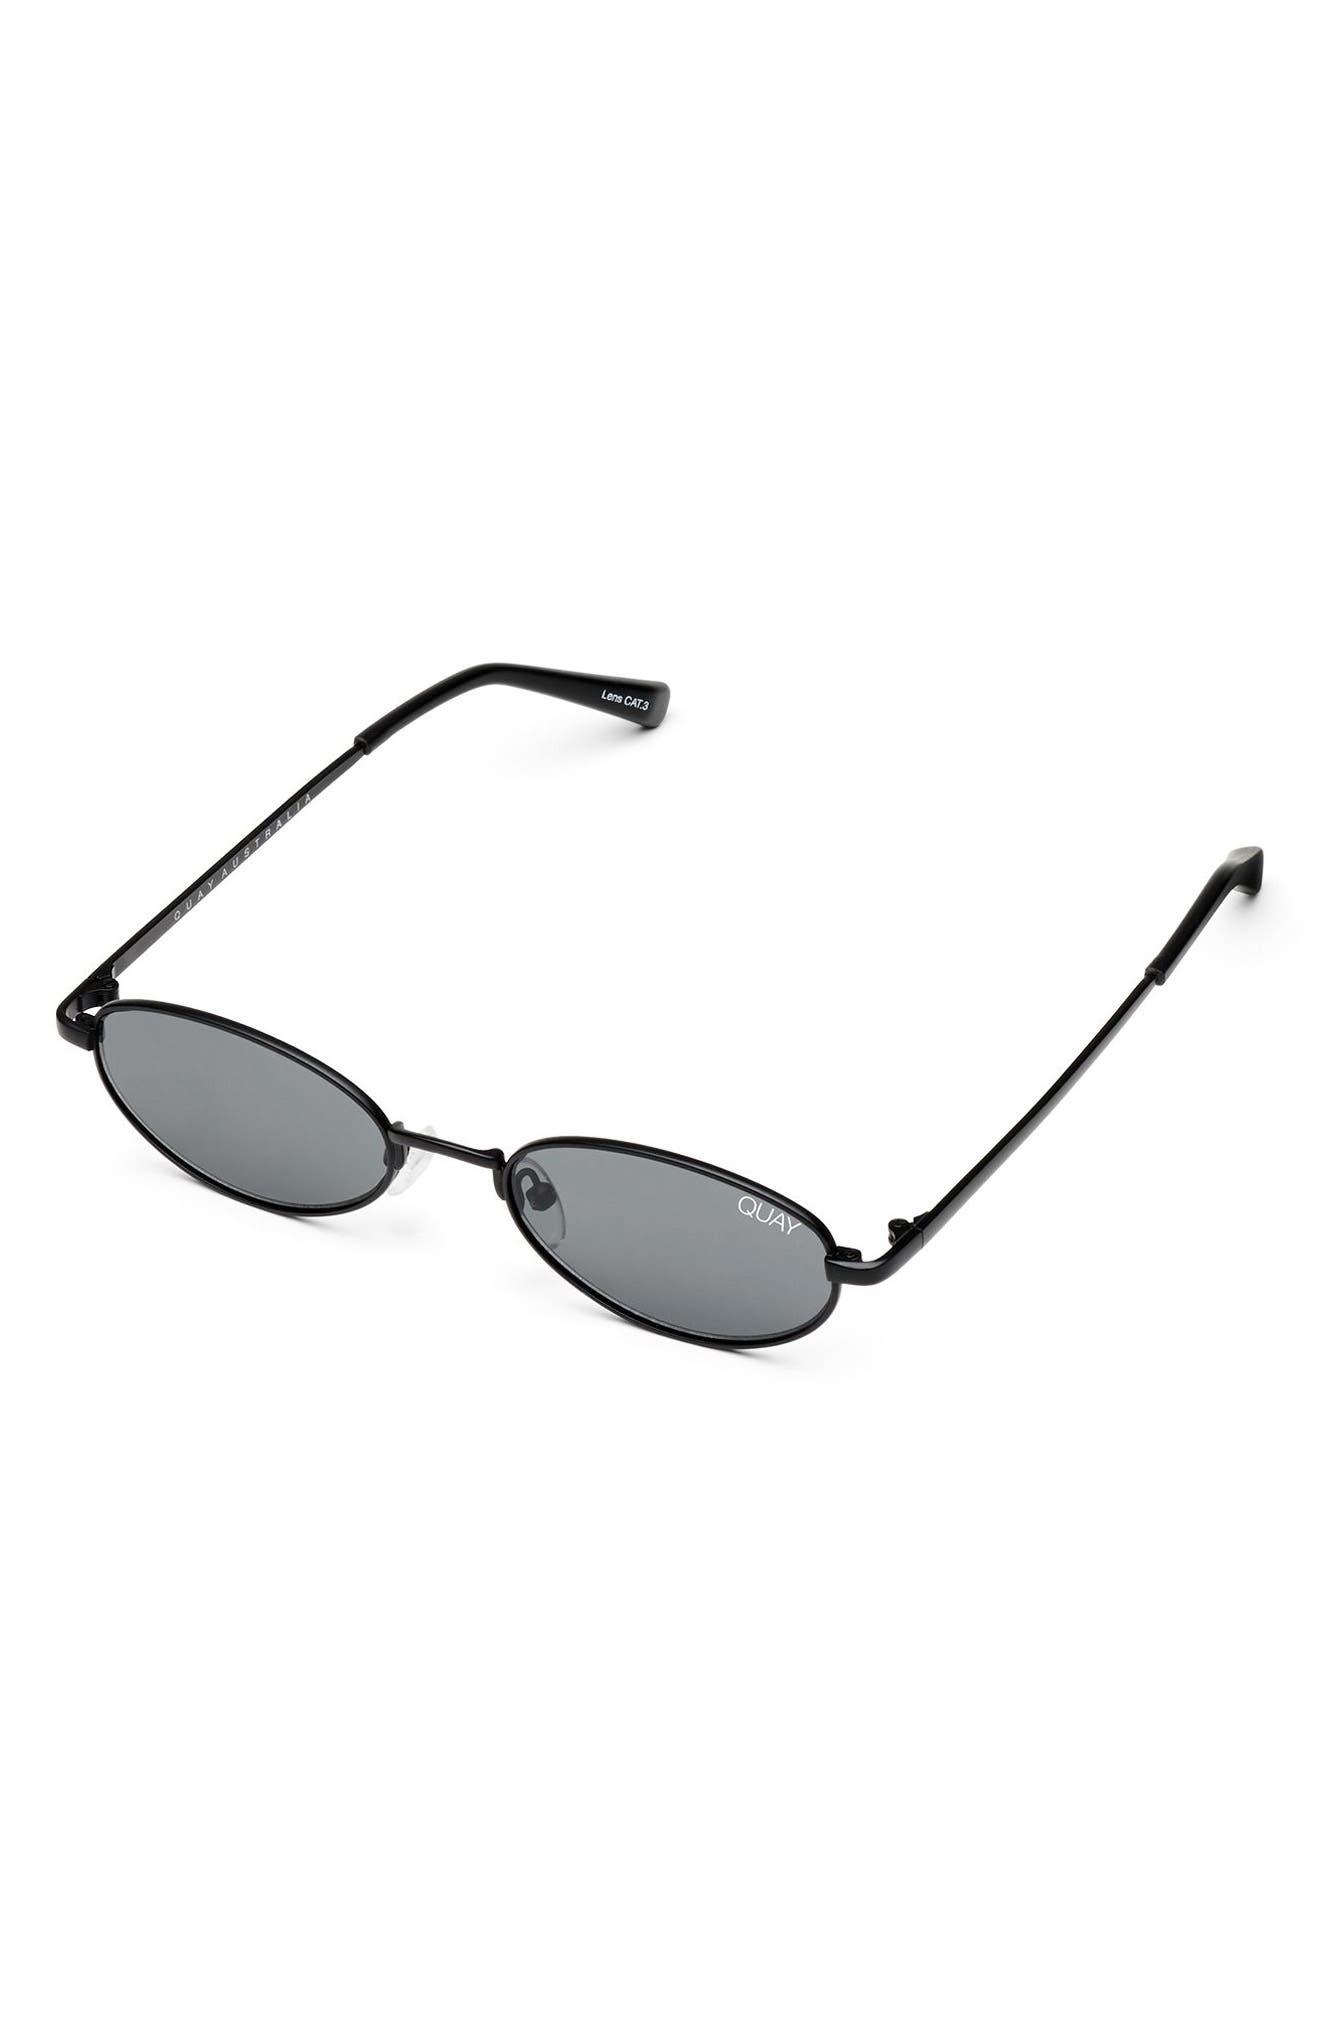 49mm Showdown Oval Sunglasses,                             Alternate thumbnail 4, color,                             BLACK/ SMOKE